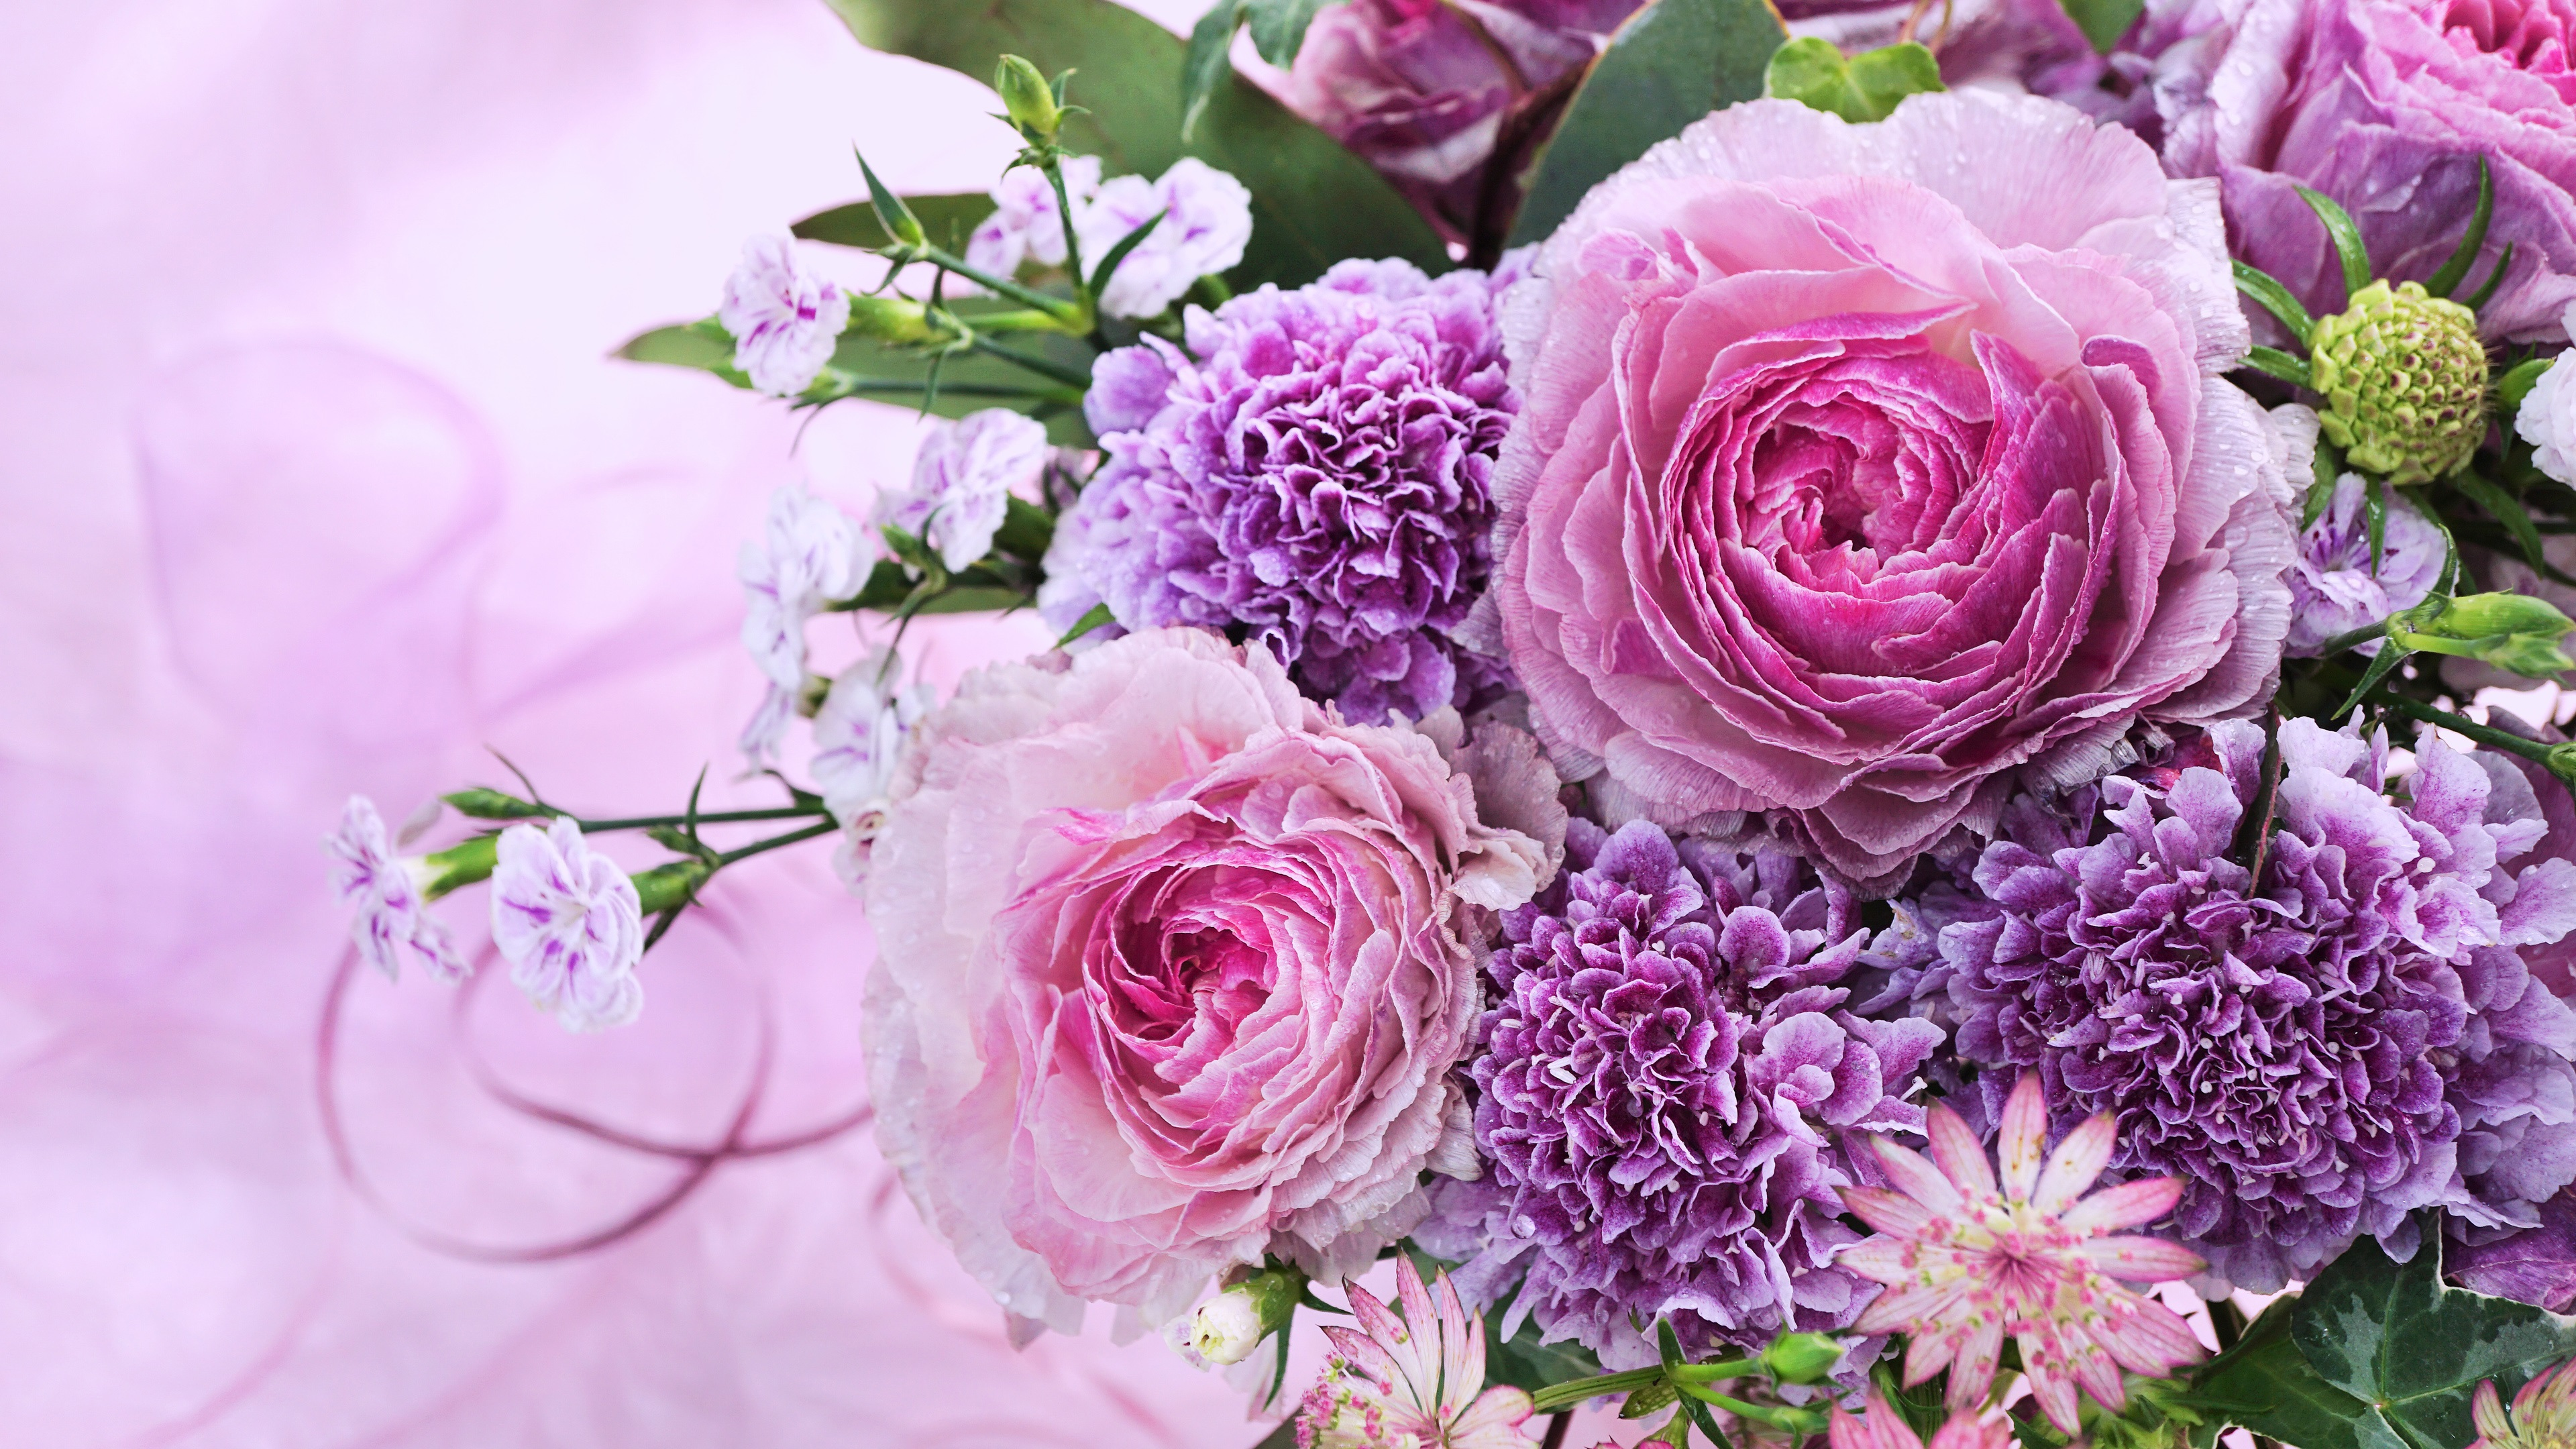 Fondos De Pantalla Flores Rosadas Crisantemo Fondo